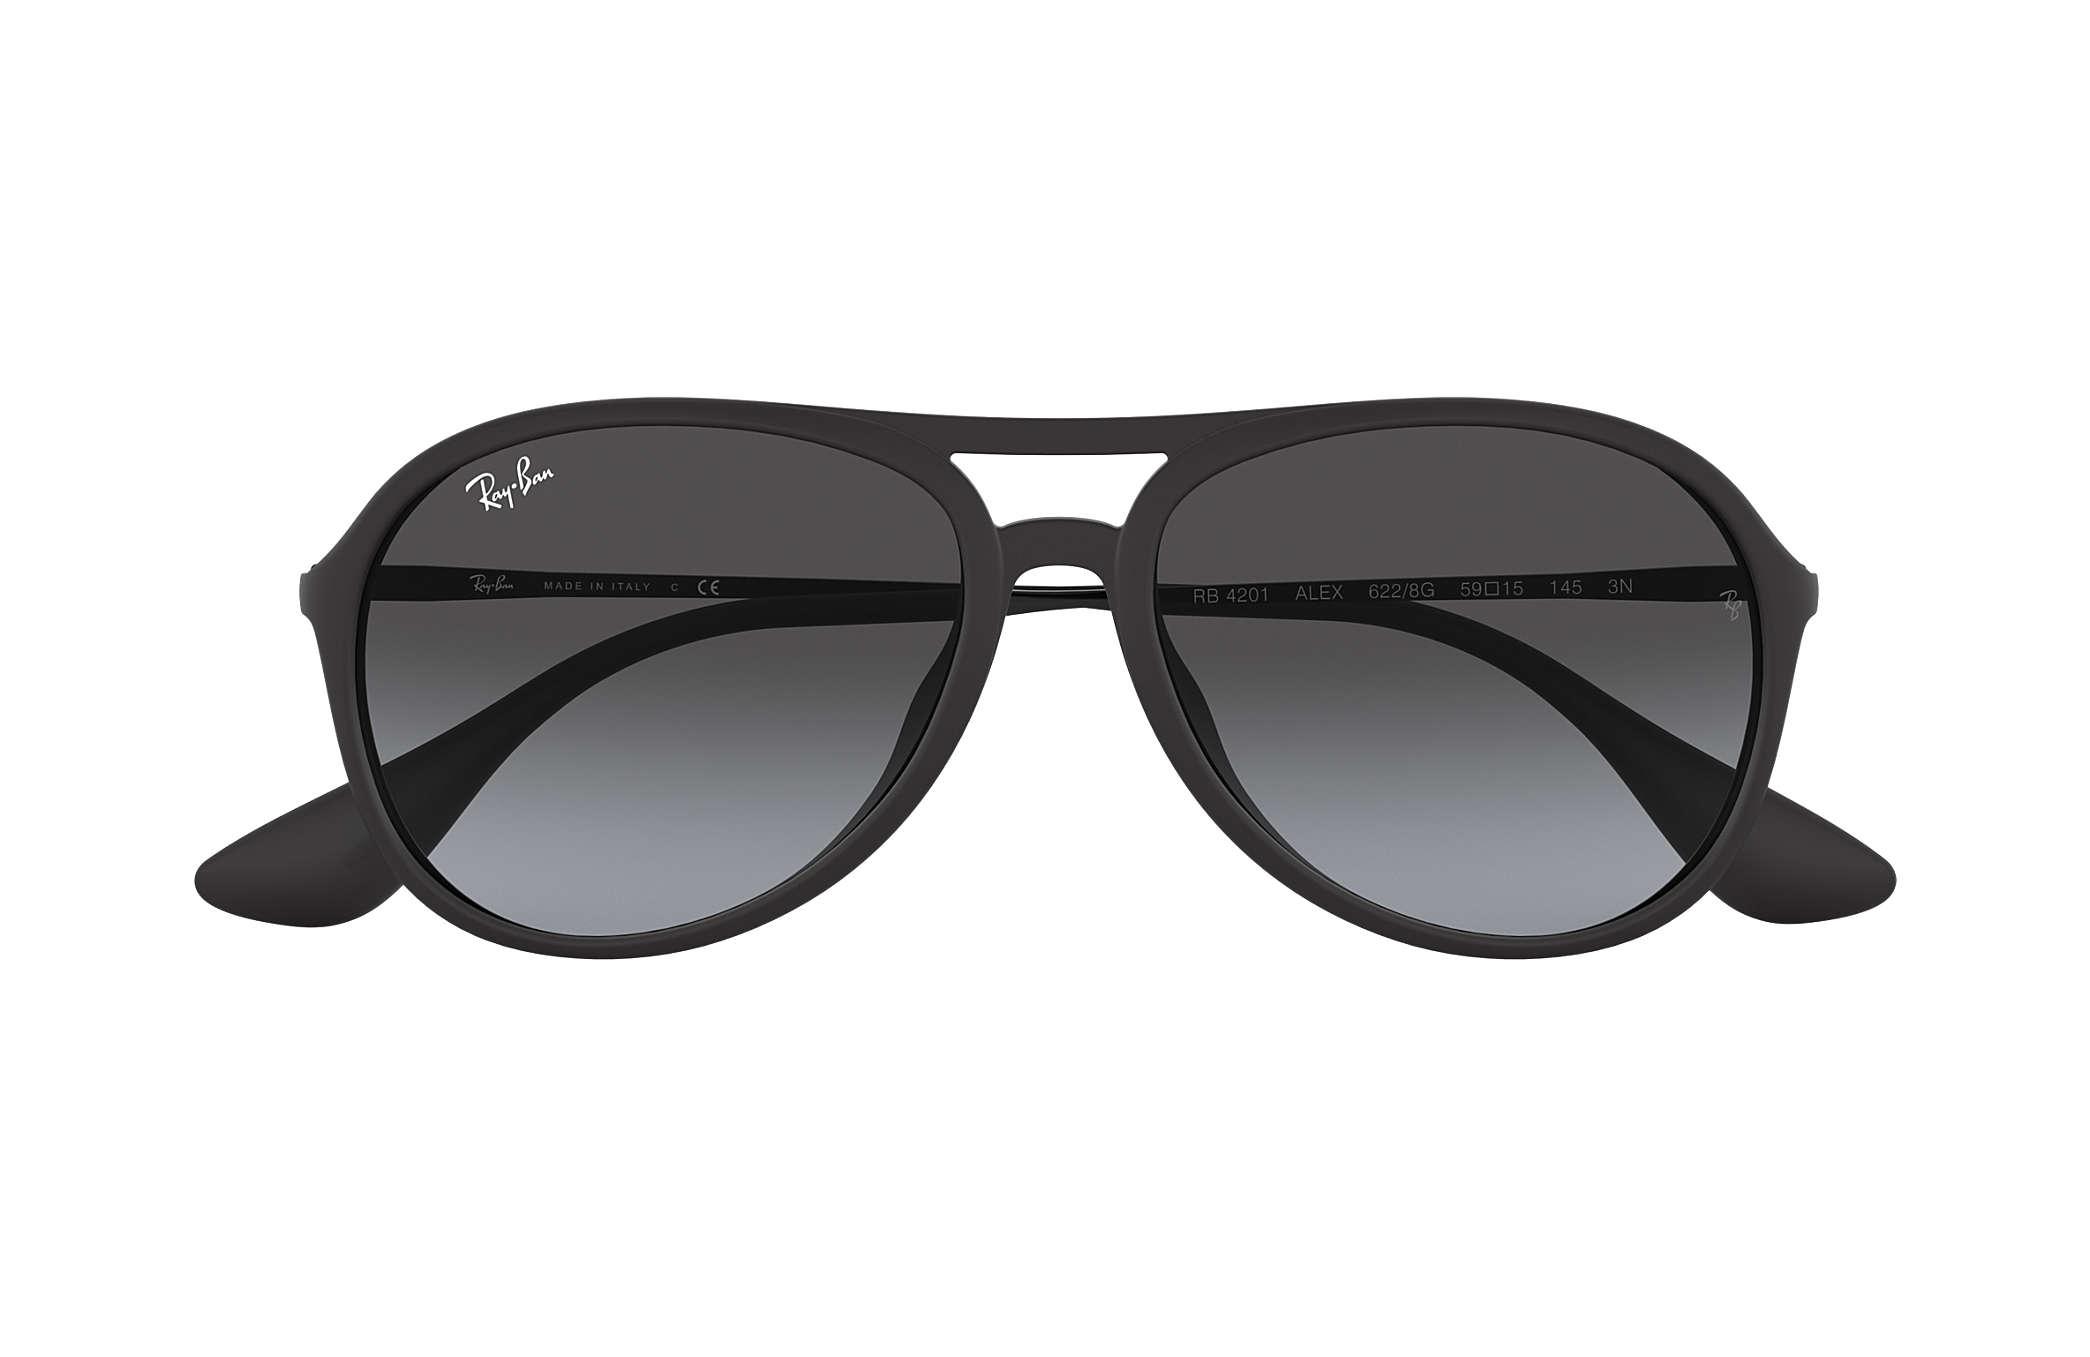 a347bb9e0a9 Ray-Ban Alex RB4201 Black - Nylon - Grey Lenses - 0RB4201622 8G59 ...